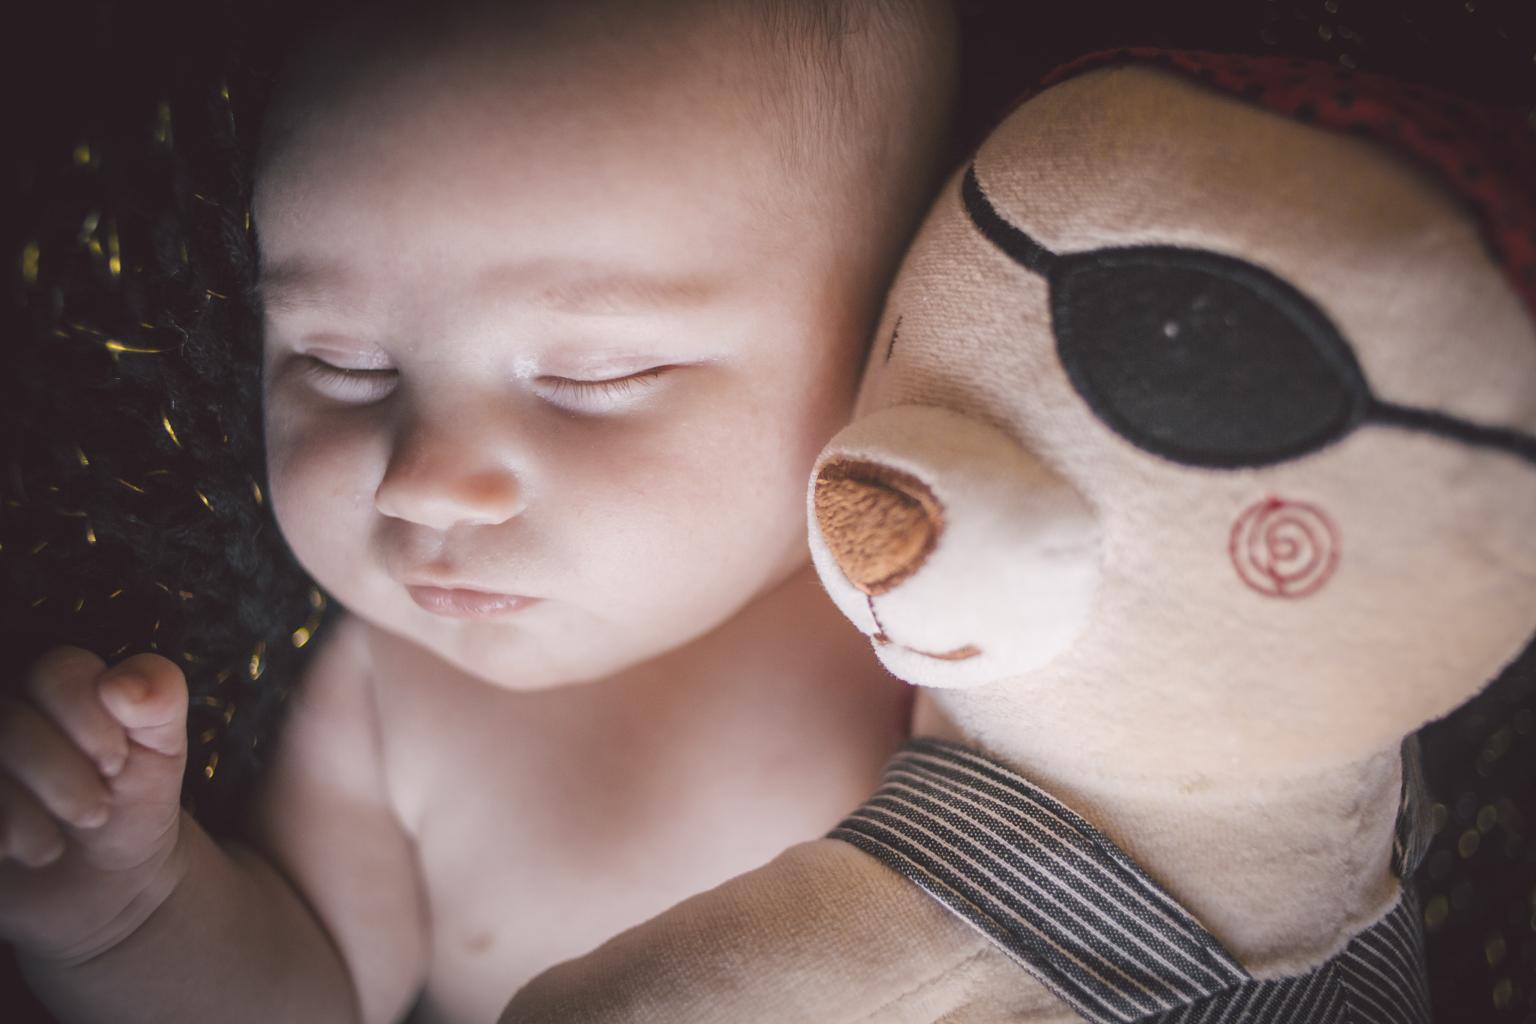 Fotógrafo de bebés en Barcelona :: Fotógrafo de recién nacido en Barcelona :: Fotógrafía de bebés natural en Barcelona